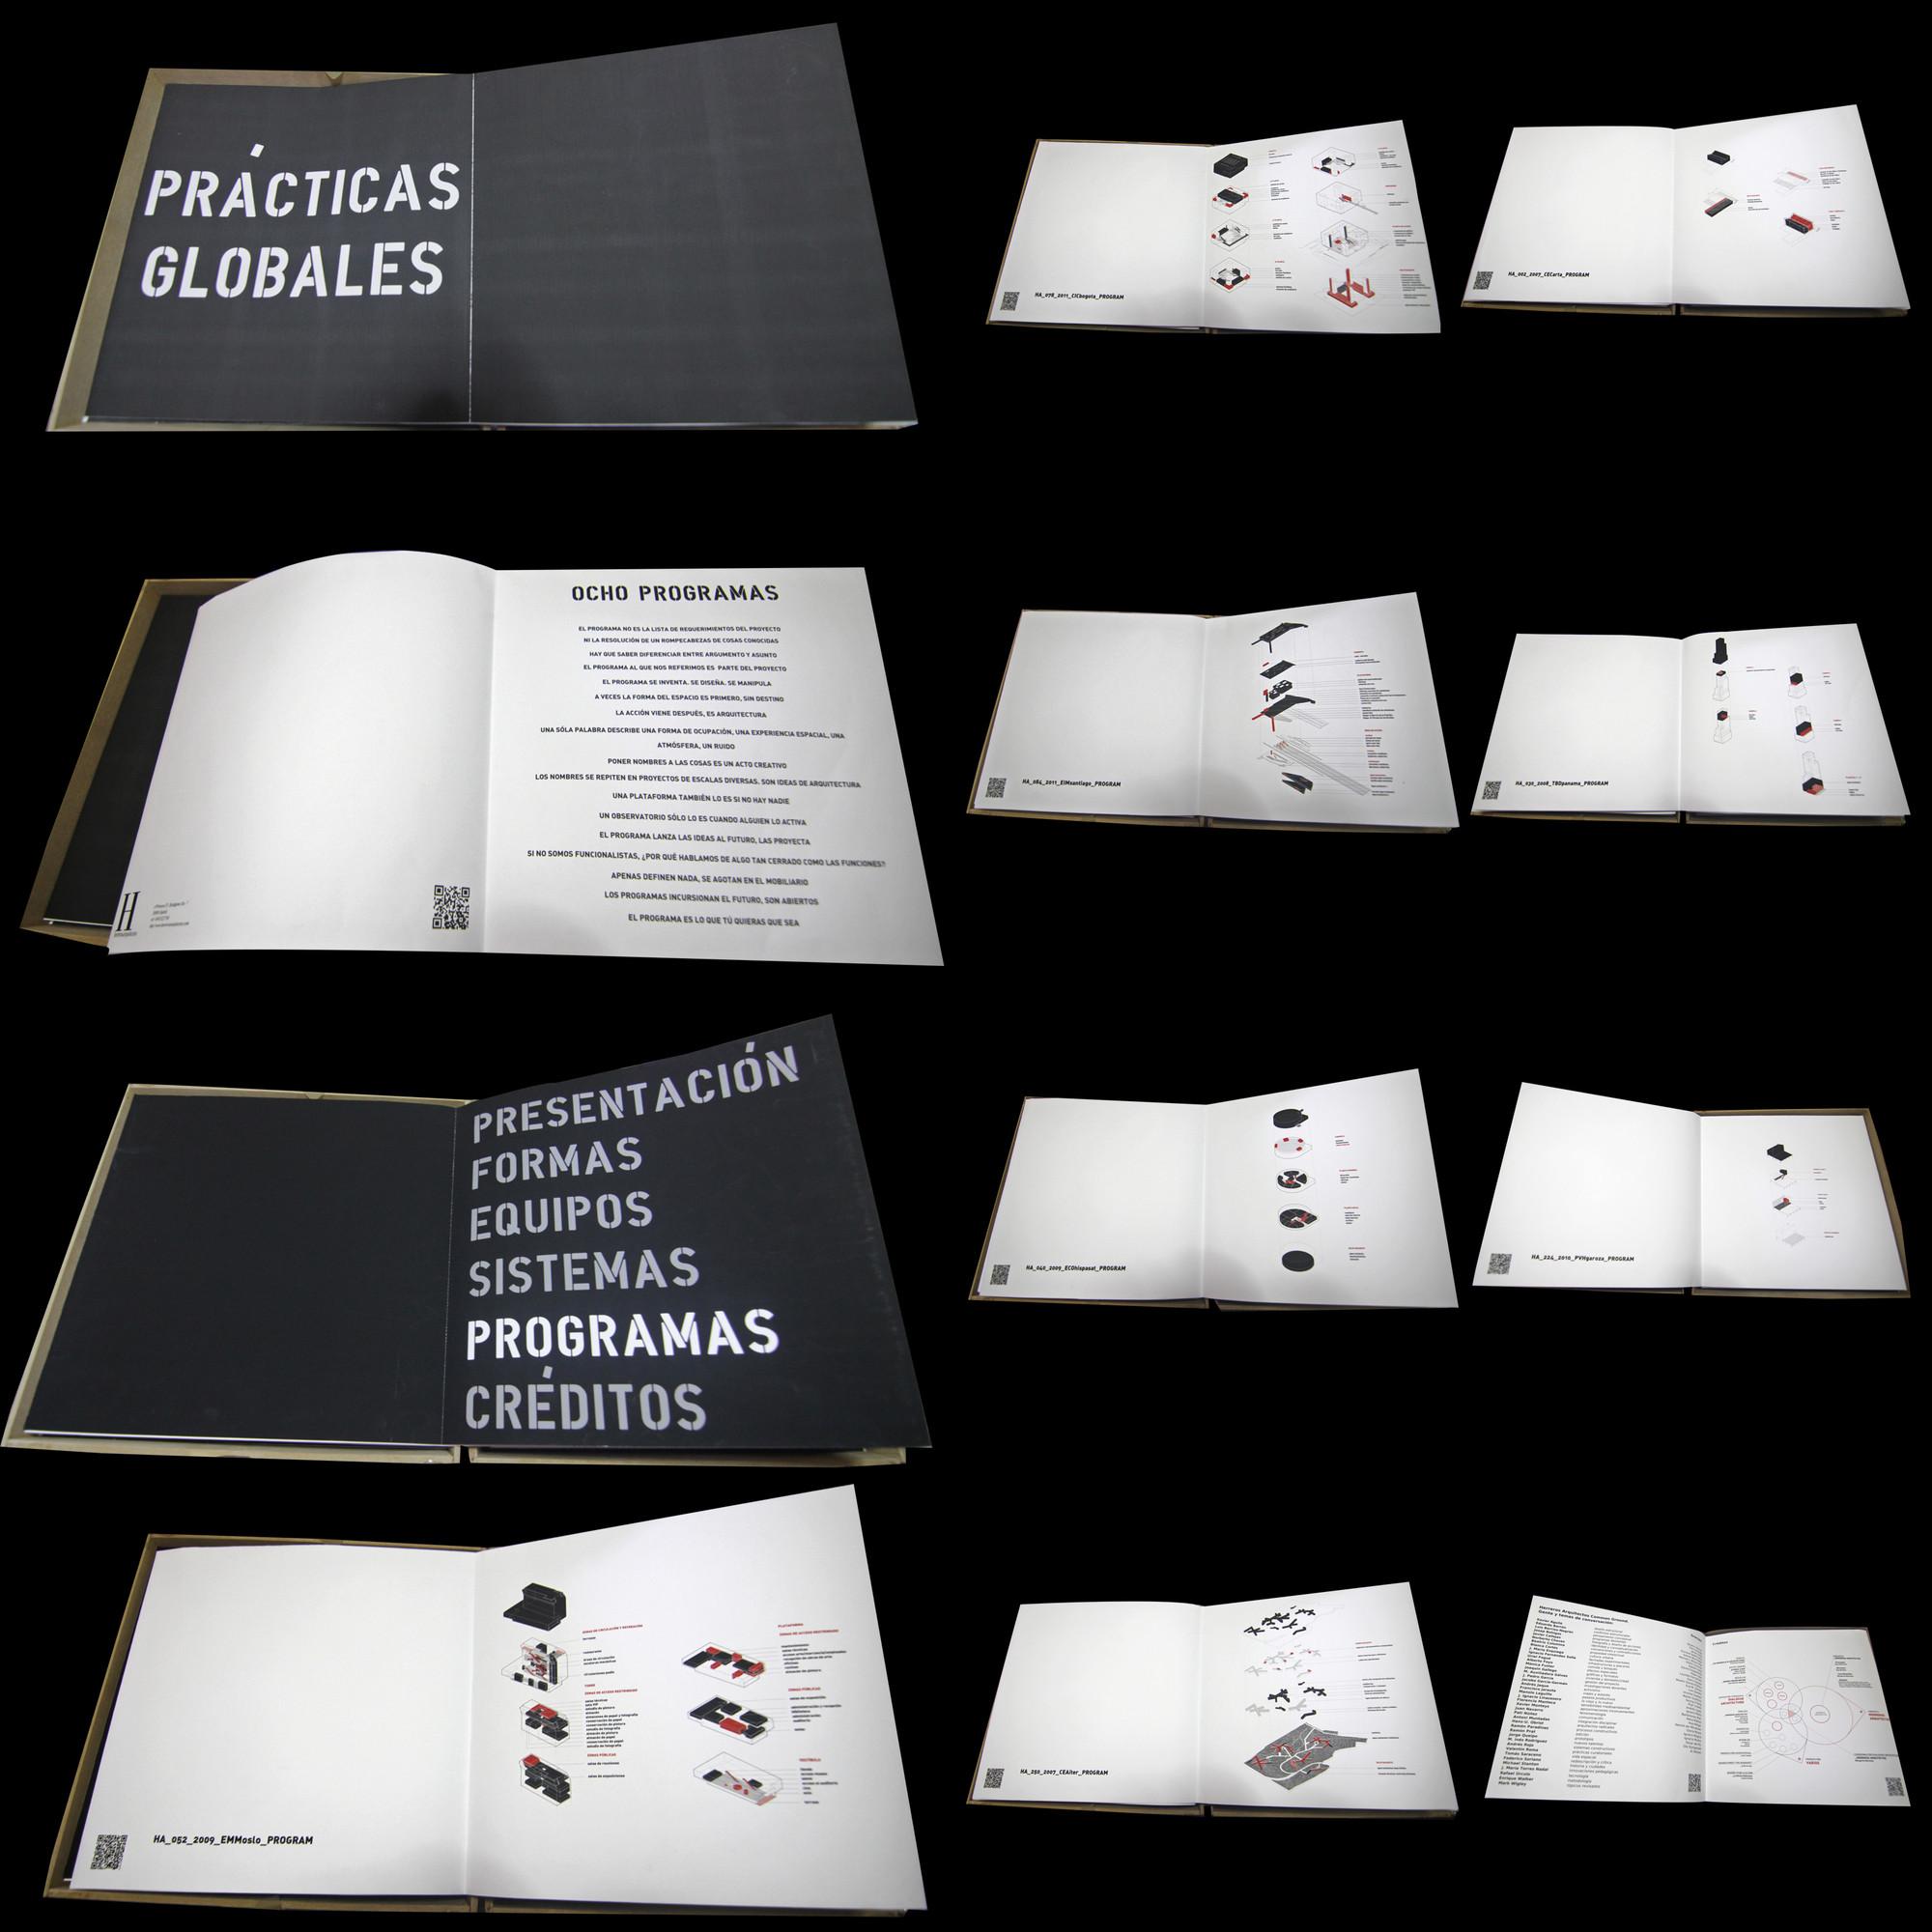 Pieza-Caja de Herreros arquitectos